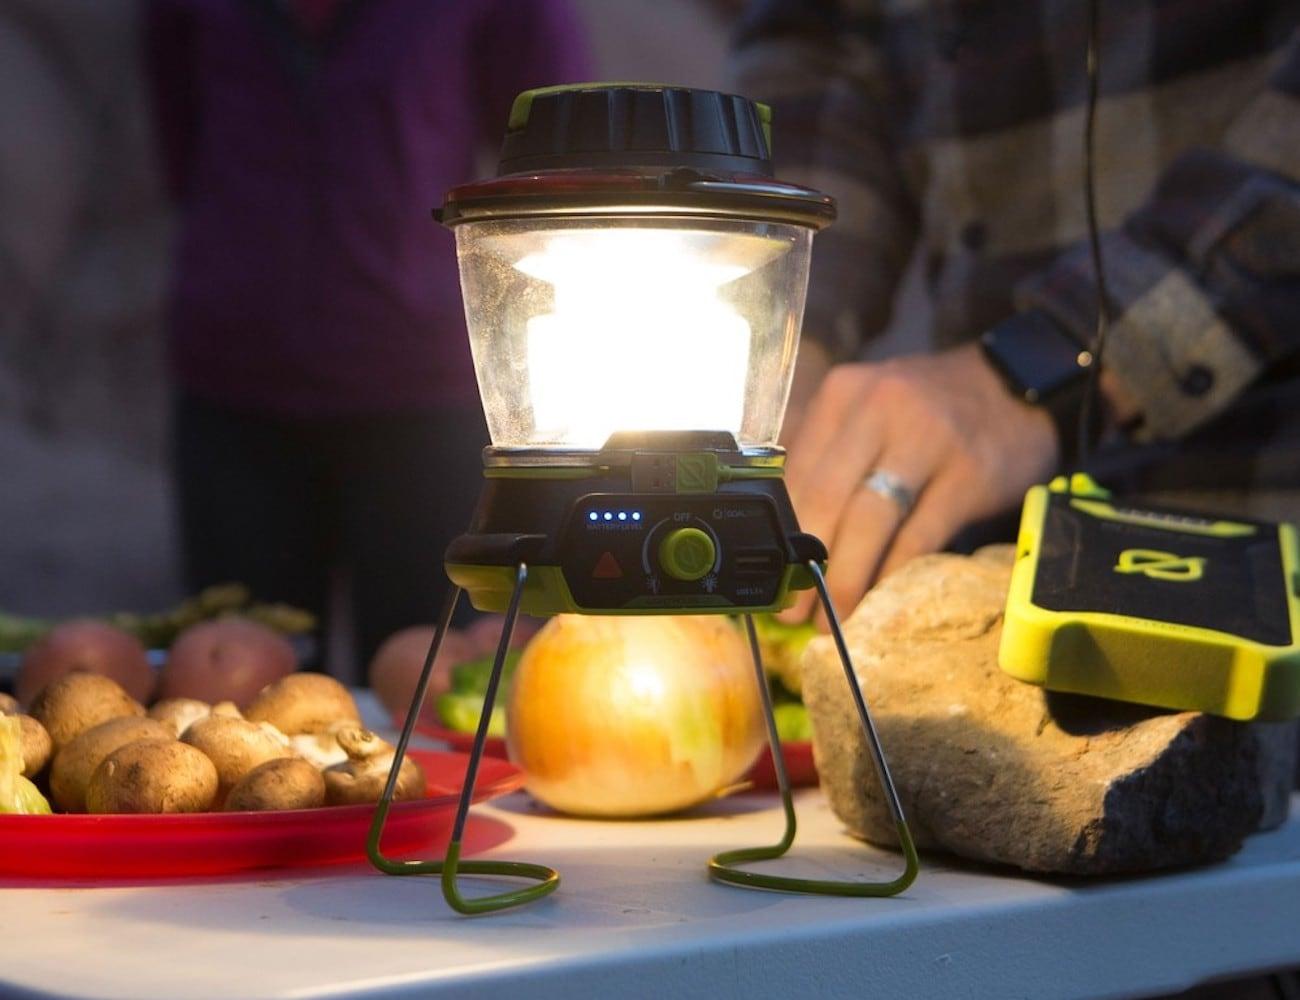 Goal Zero Lighthouse 400 USB Power Hub Lantern provides light and power